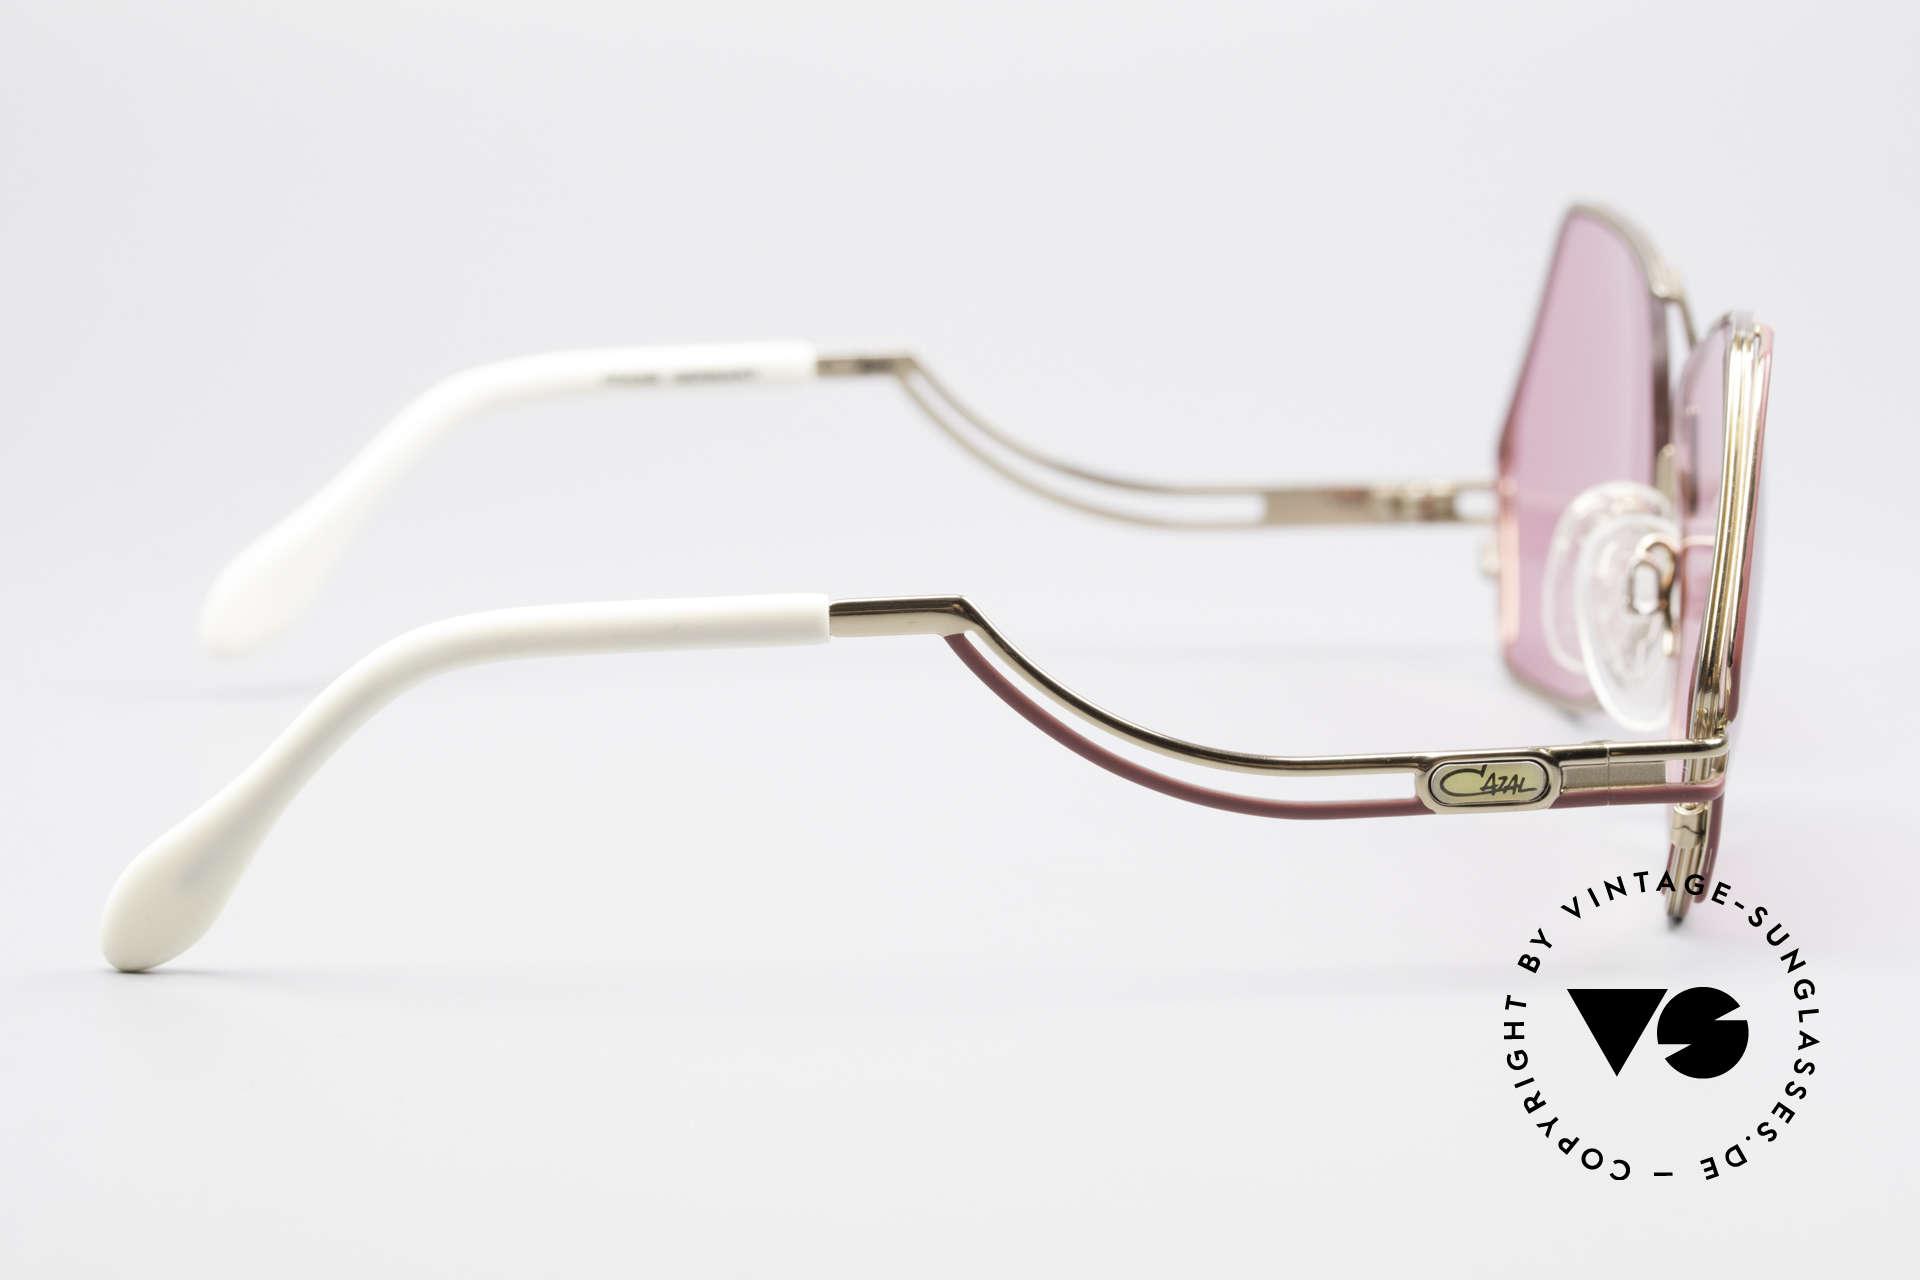 Cazal 226 Pink Vintage Ladies Sunglasses, NO RETRO SUNGLASSES, but a genuine old ORIGINAL!, Made for Women